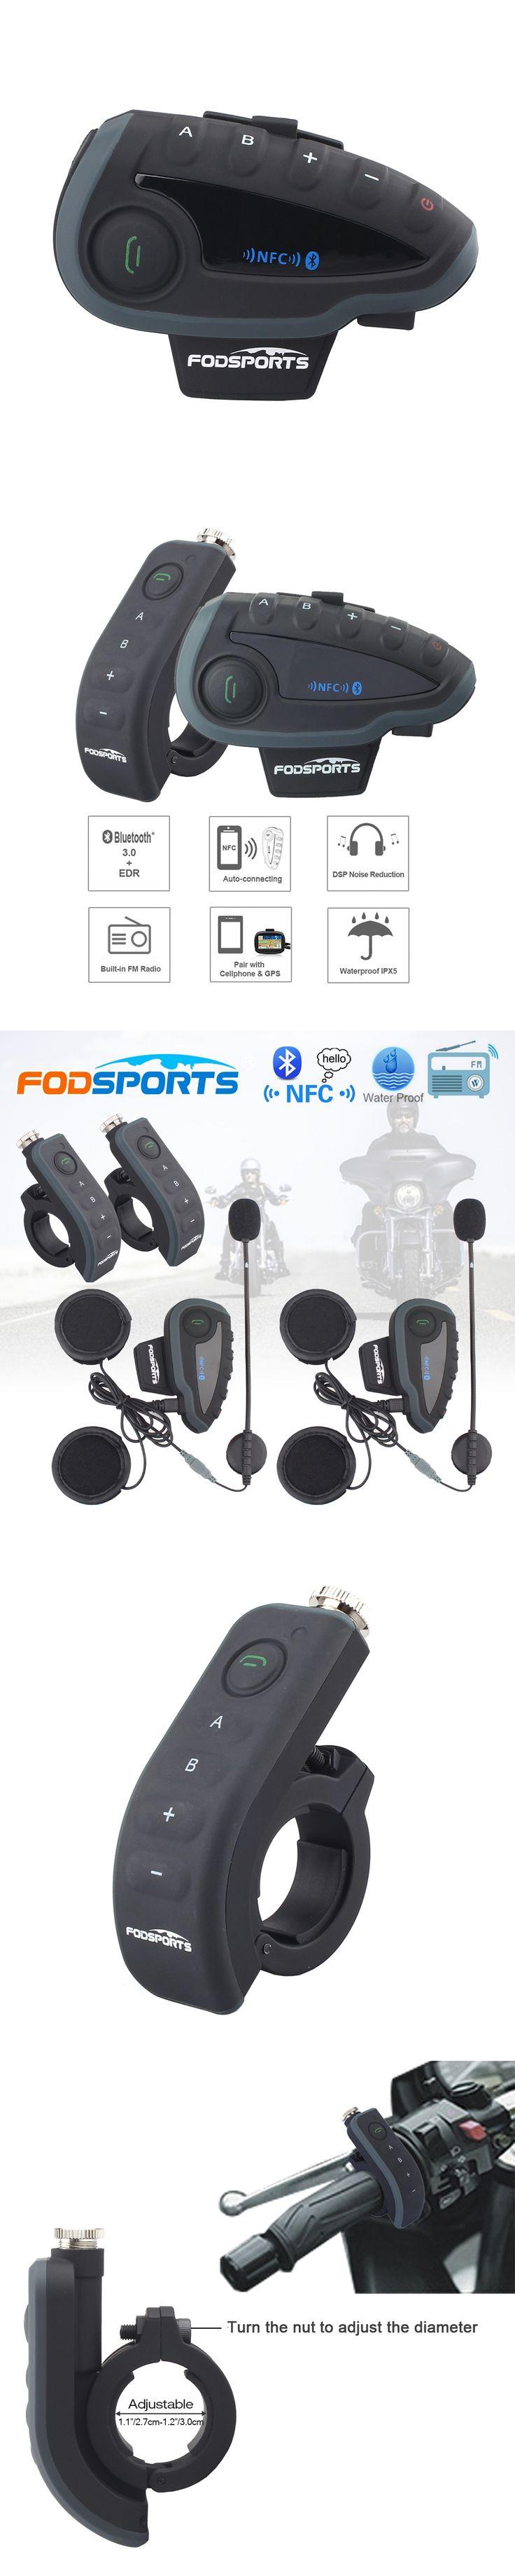 2 pcs V8 Motorcycle Helmet Bluetooth Intercom Helmet Headset Headphone 5 Riders BT Interphones FM Radio NFC Remote Control